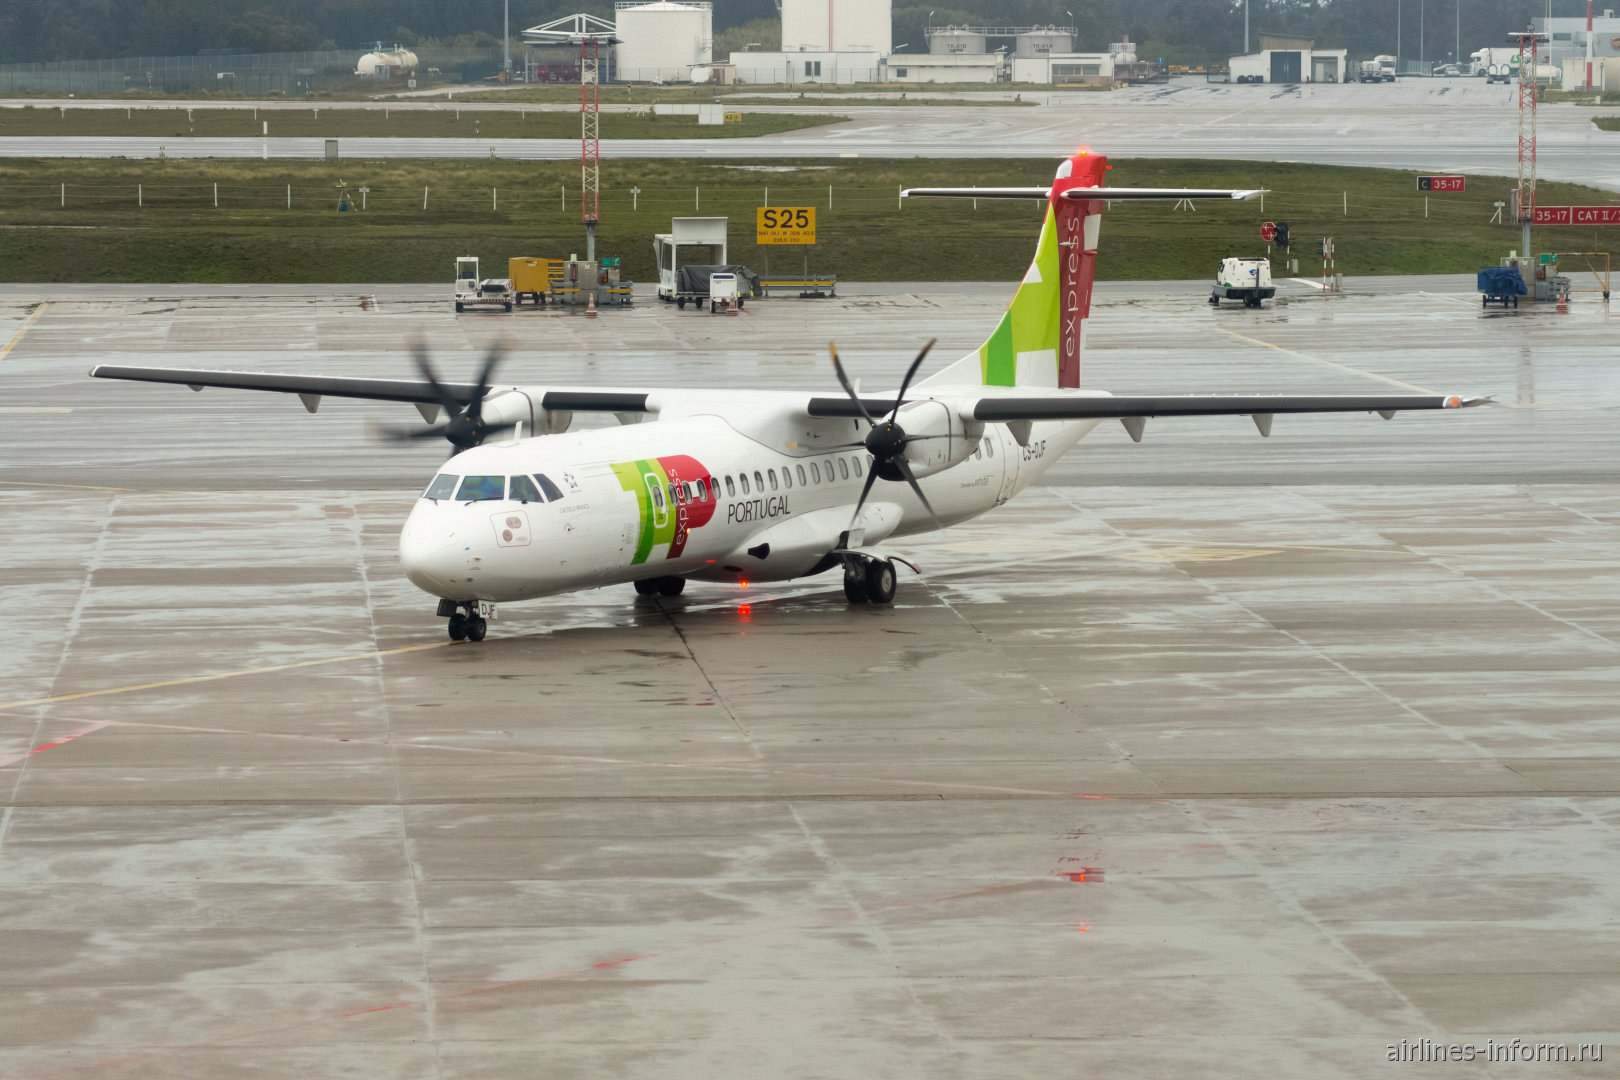 Cамолет ATR 72 авиакомпании White Airways в окраске TAP Express в аэропорту Порту